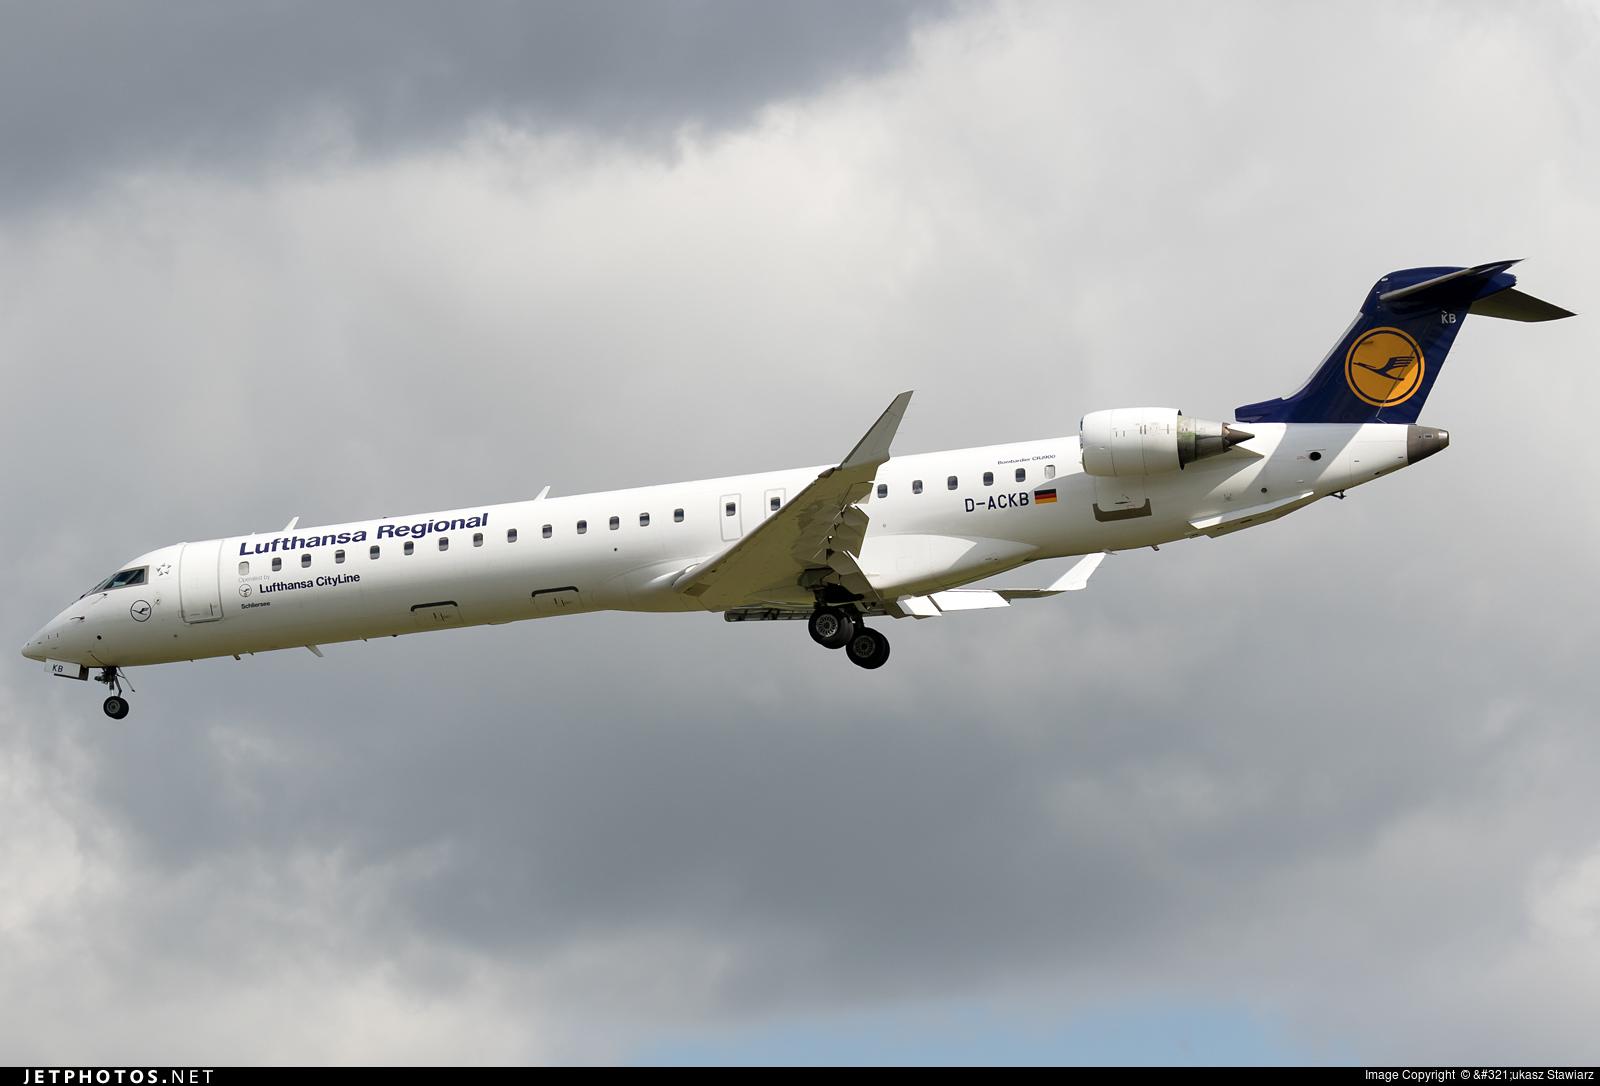 D-ACKB - Bombardier CRJ-900LR - Lufthansa Regional (CityLine)